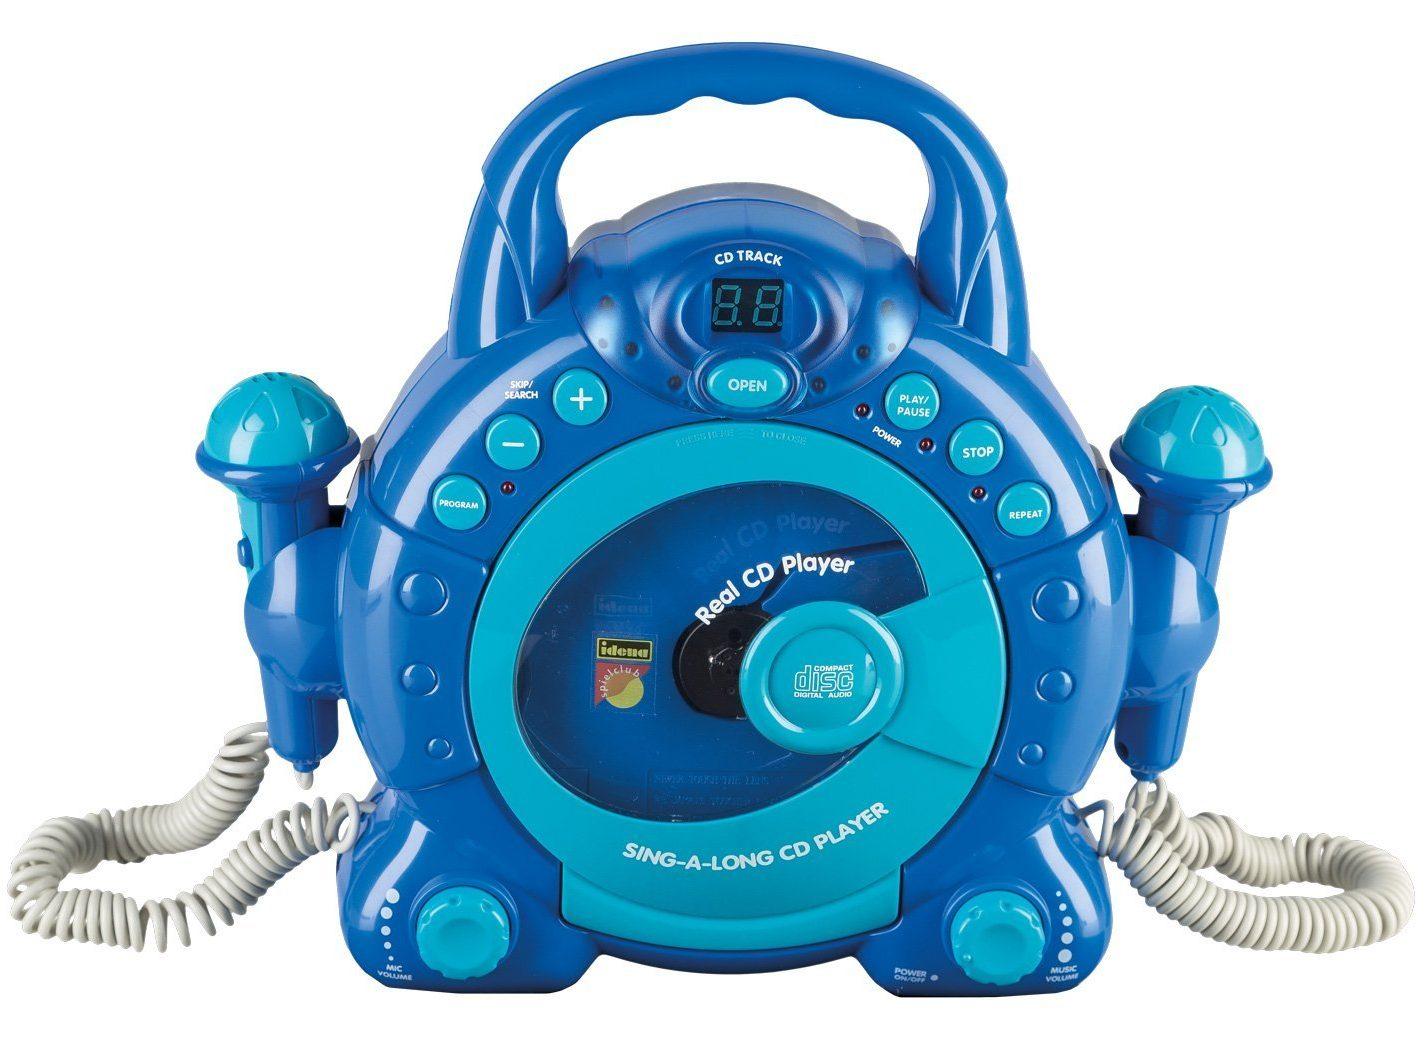 Kindgerechter Mp3 Player kinder cd-player vergleich – die besten kindgerechten cd-spieler